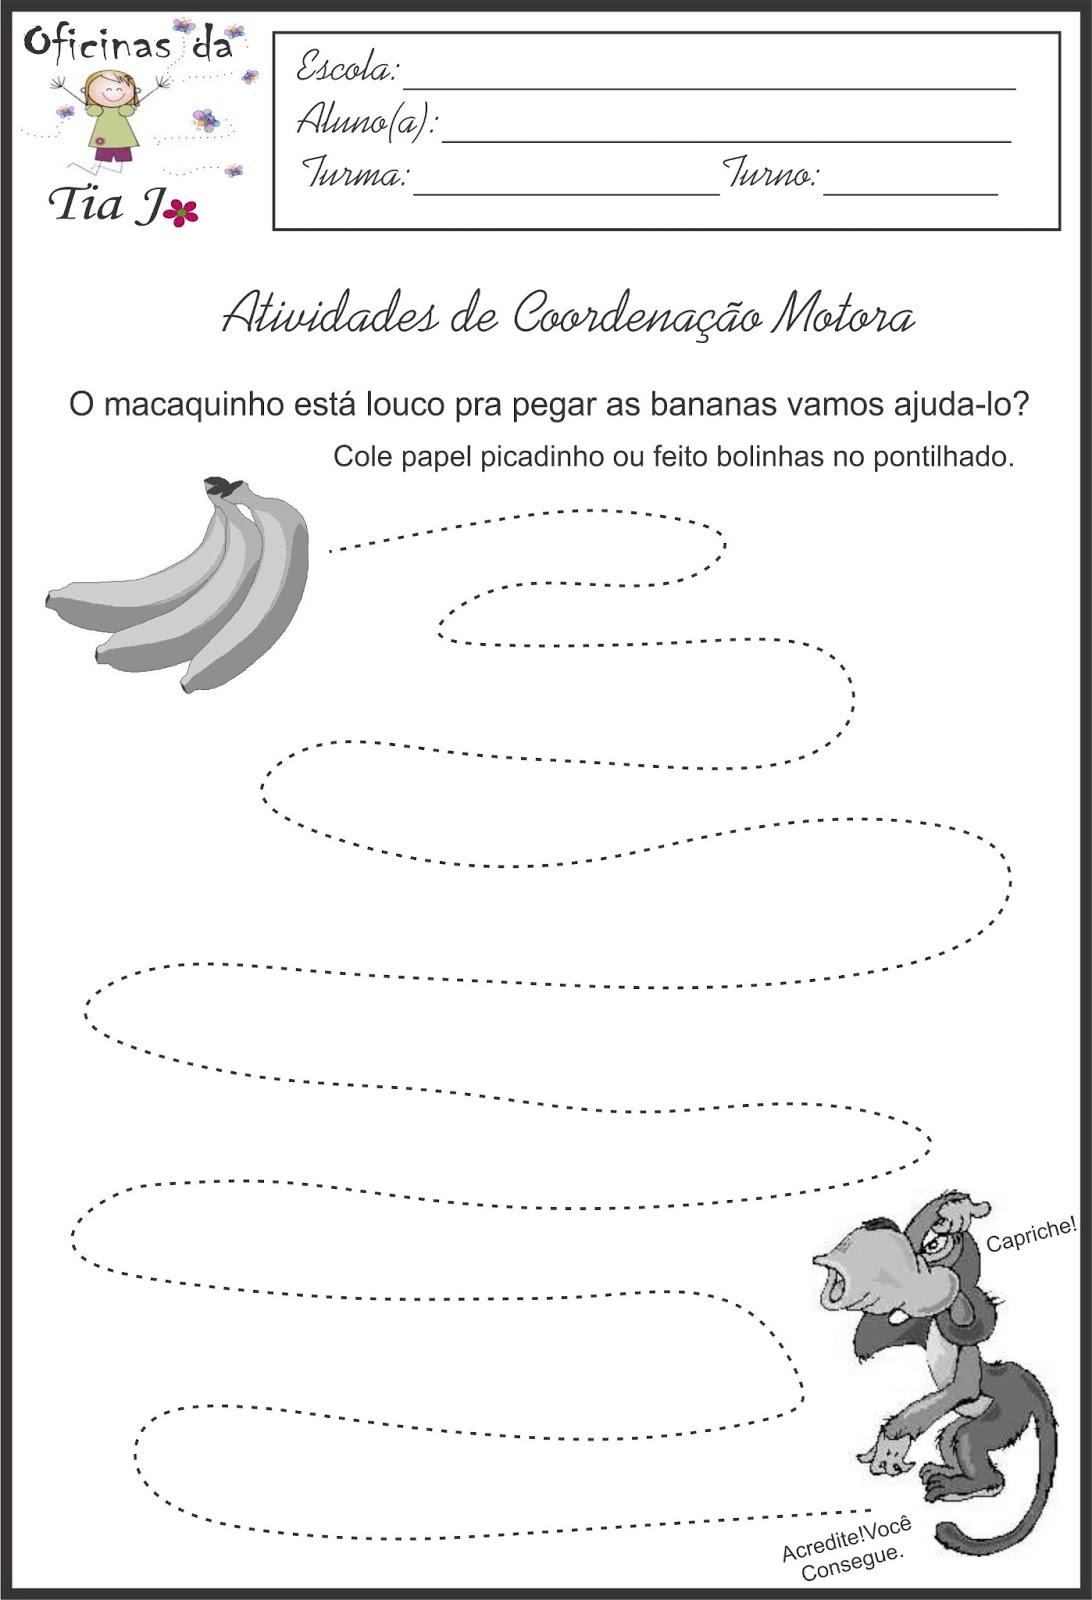 Excepcional Coordenação motora fina | Jossandra Barbosa TL92